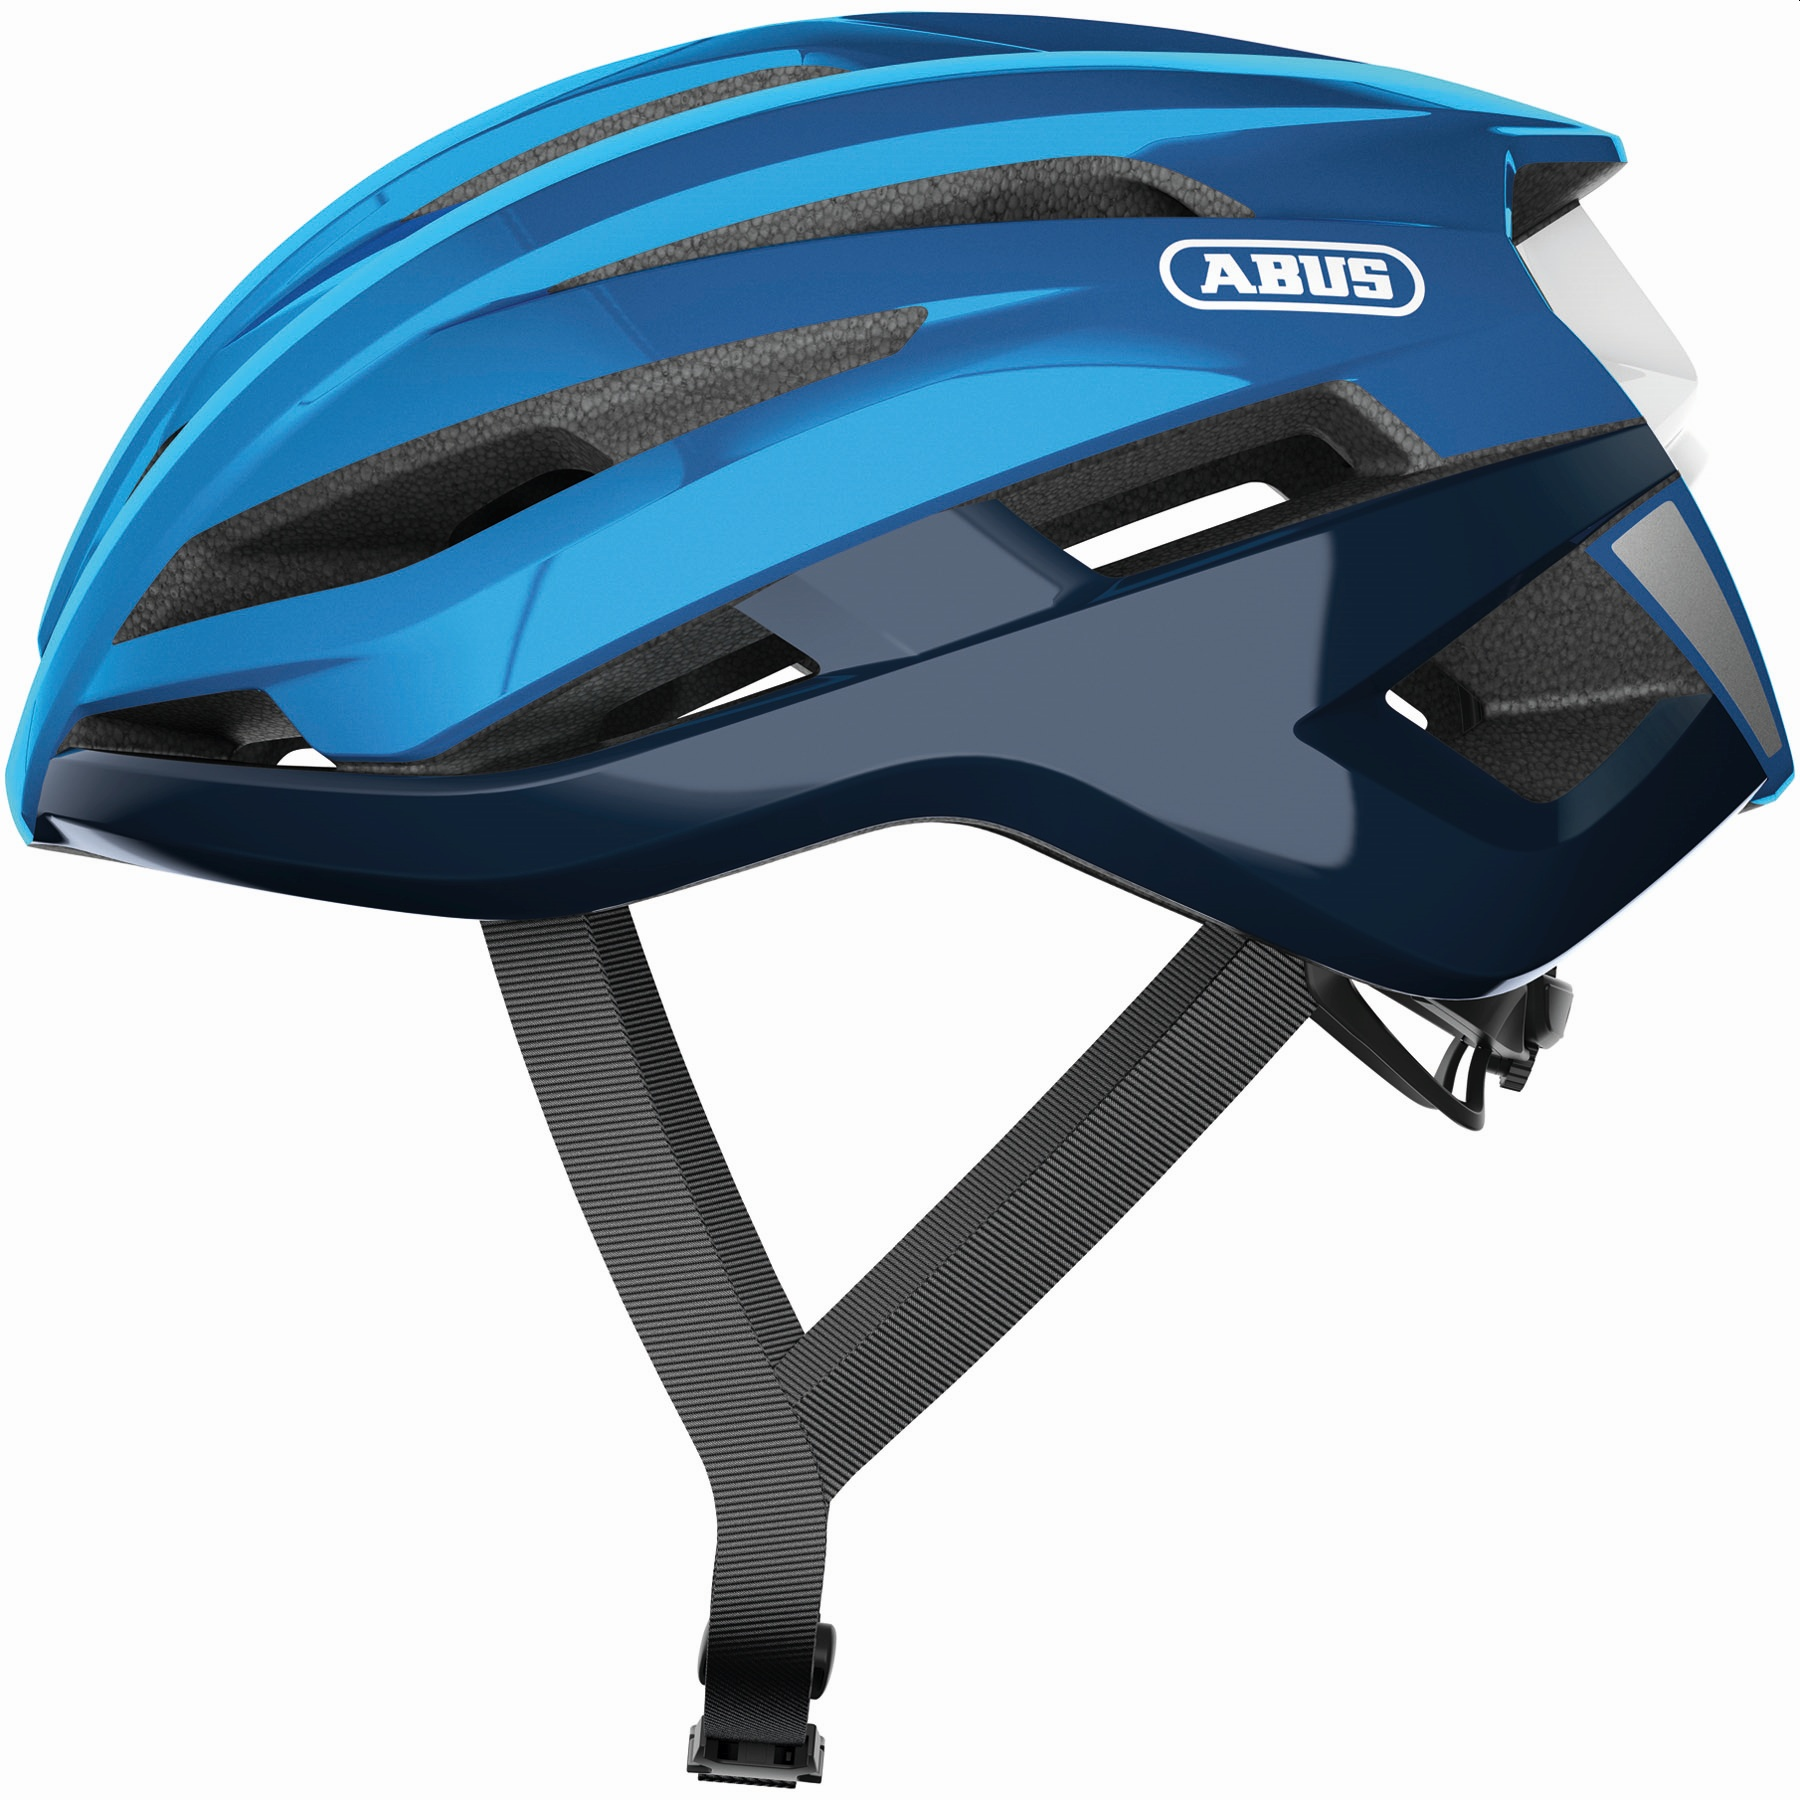 ABUS StormChaser Casco Carretera - steel blue